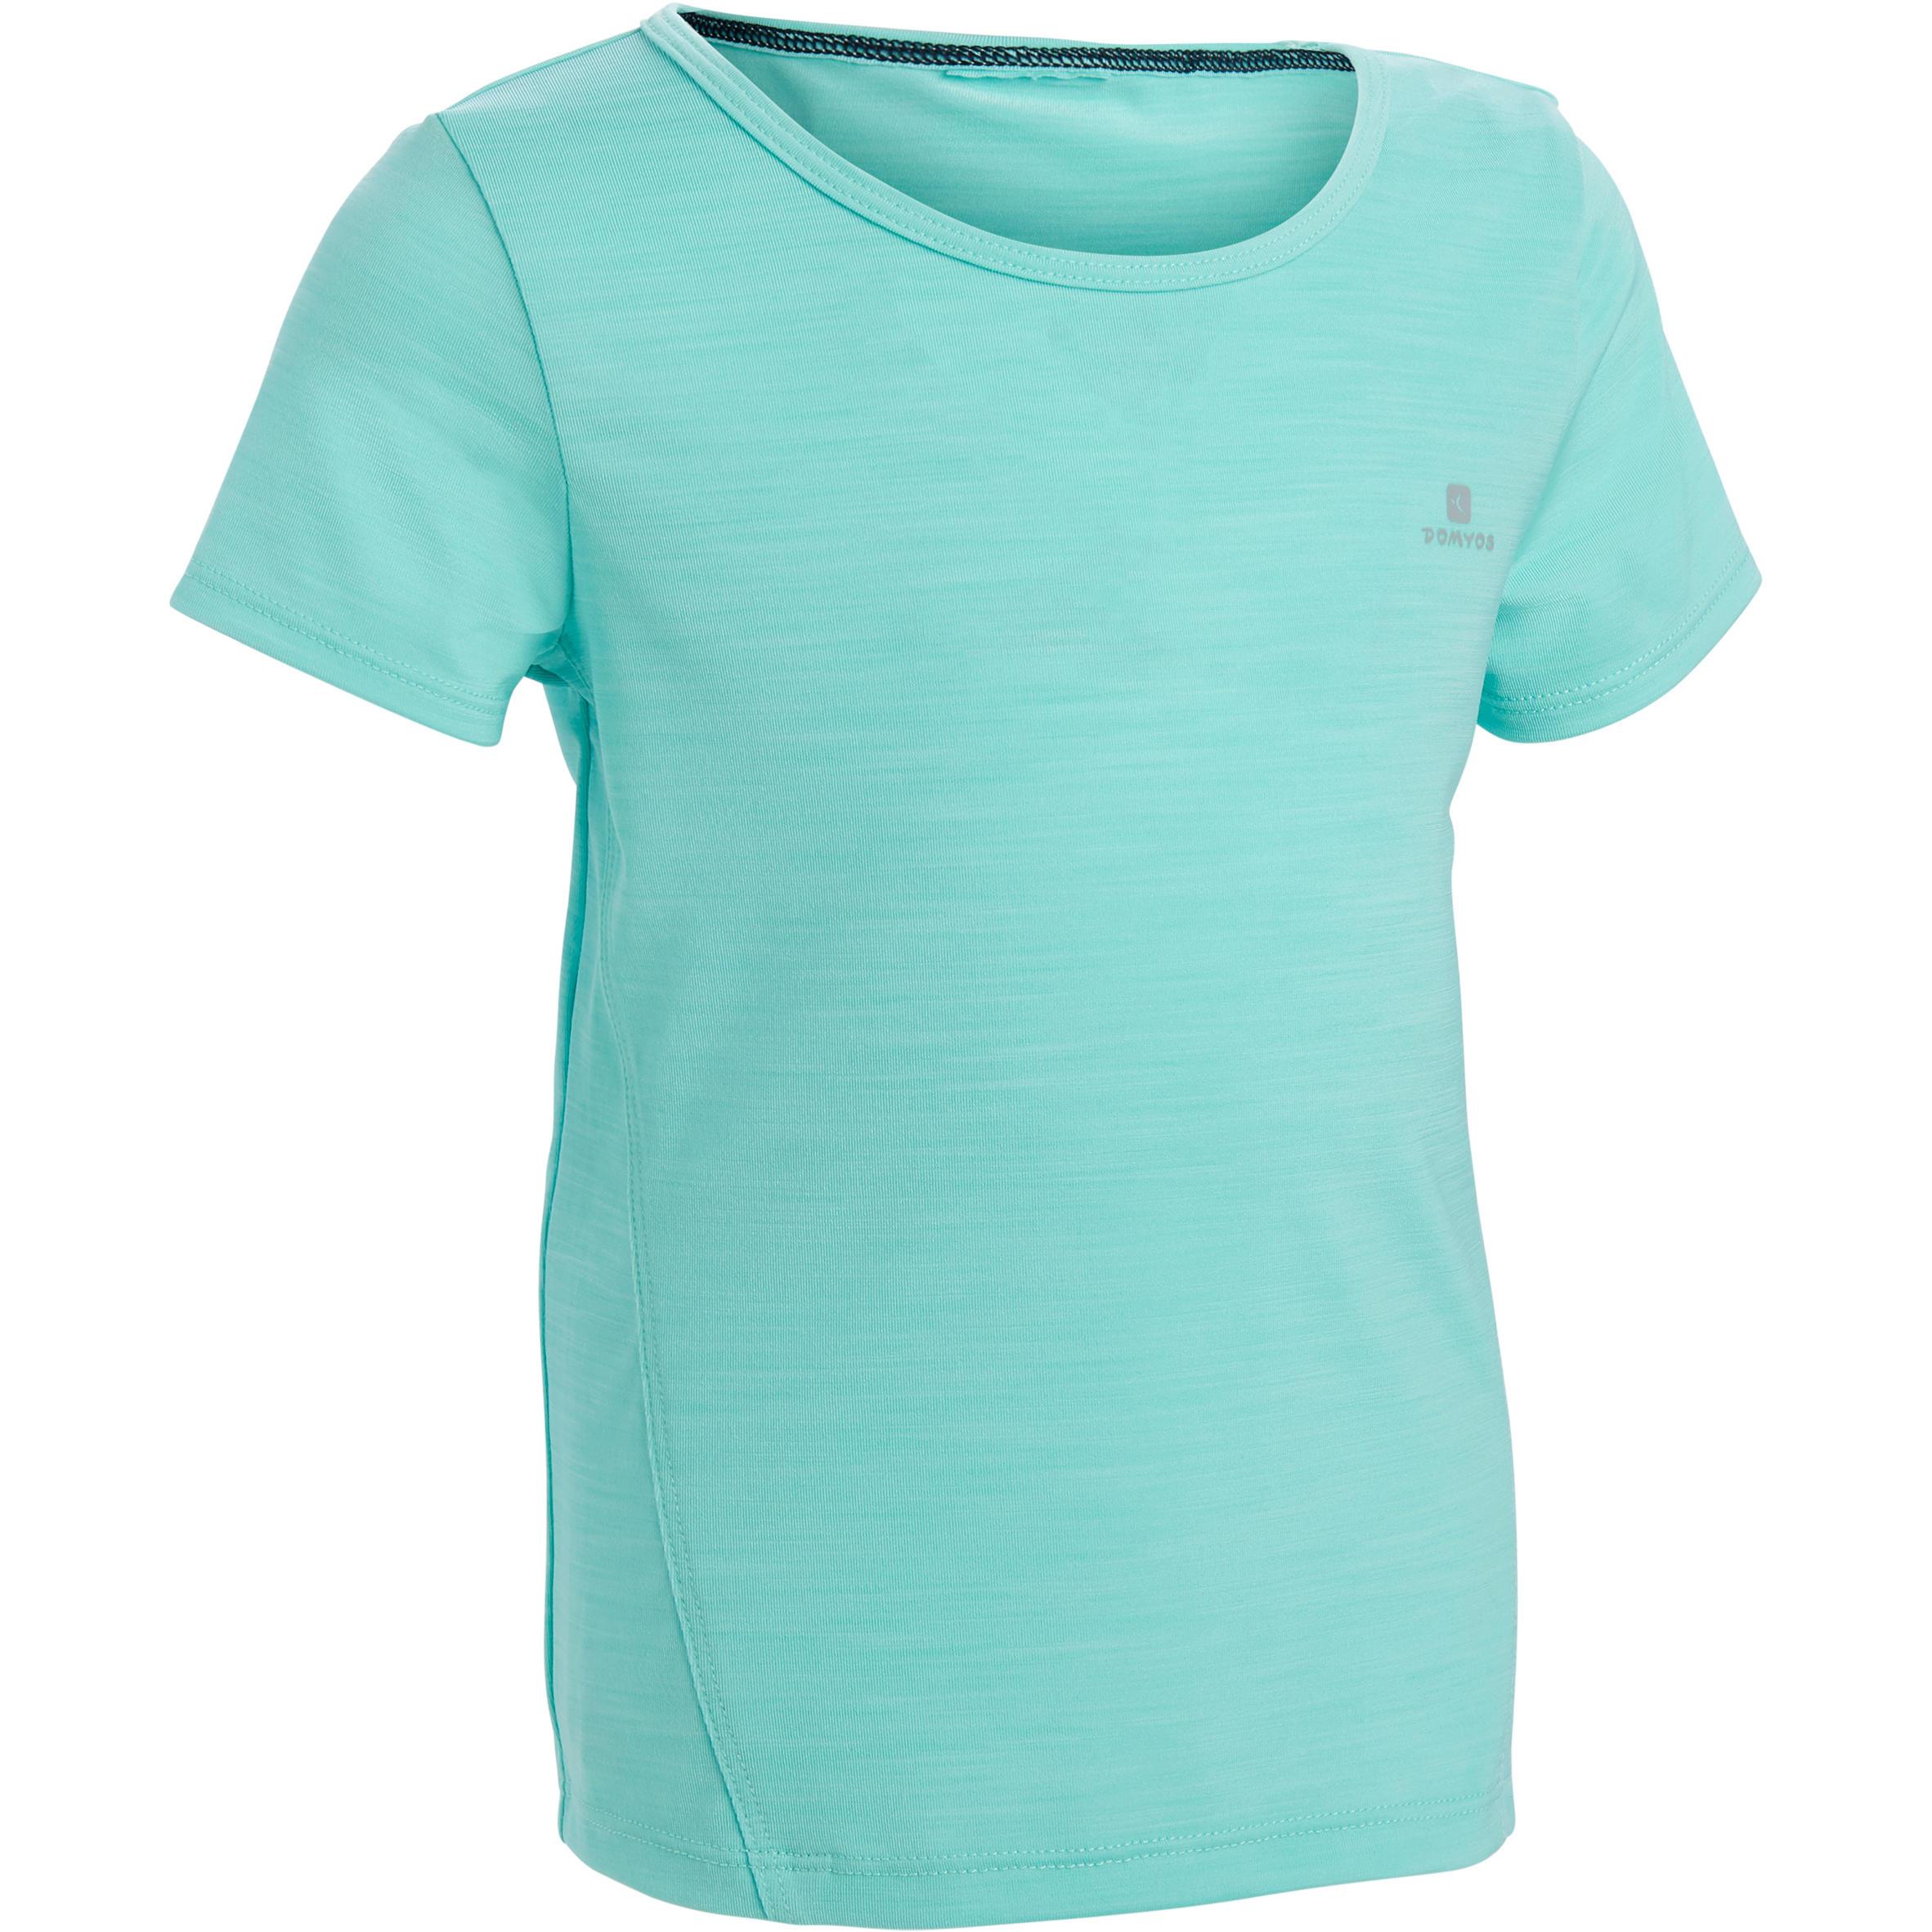 560 Baby Gym Short-Sleeved T-Shirt - Blue